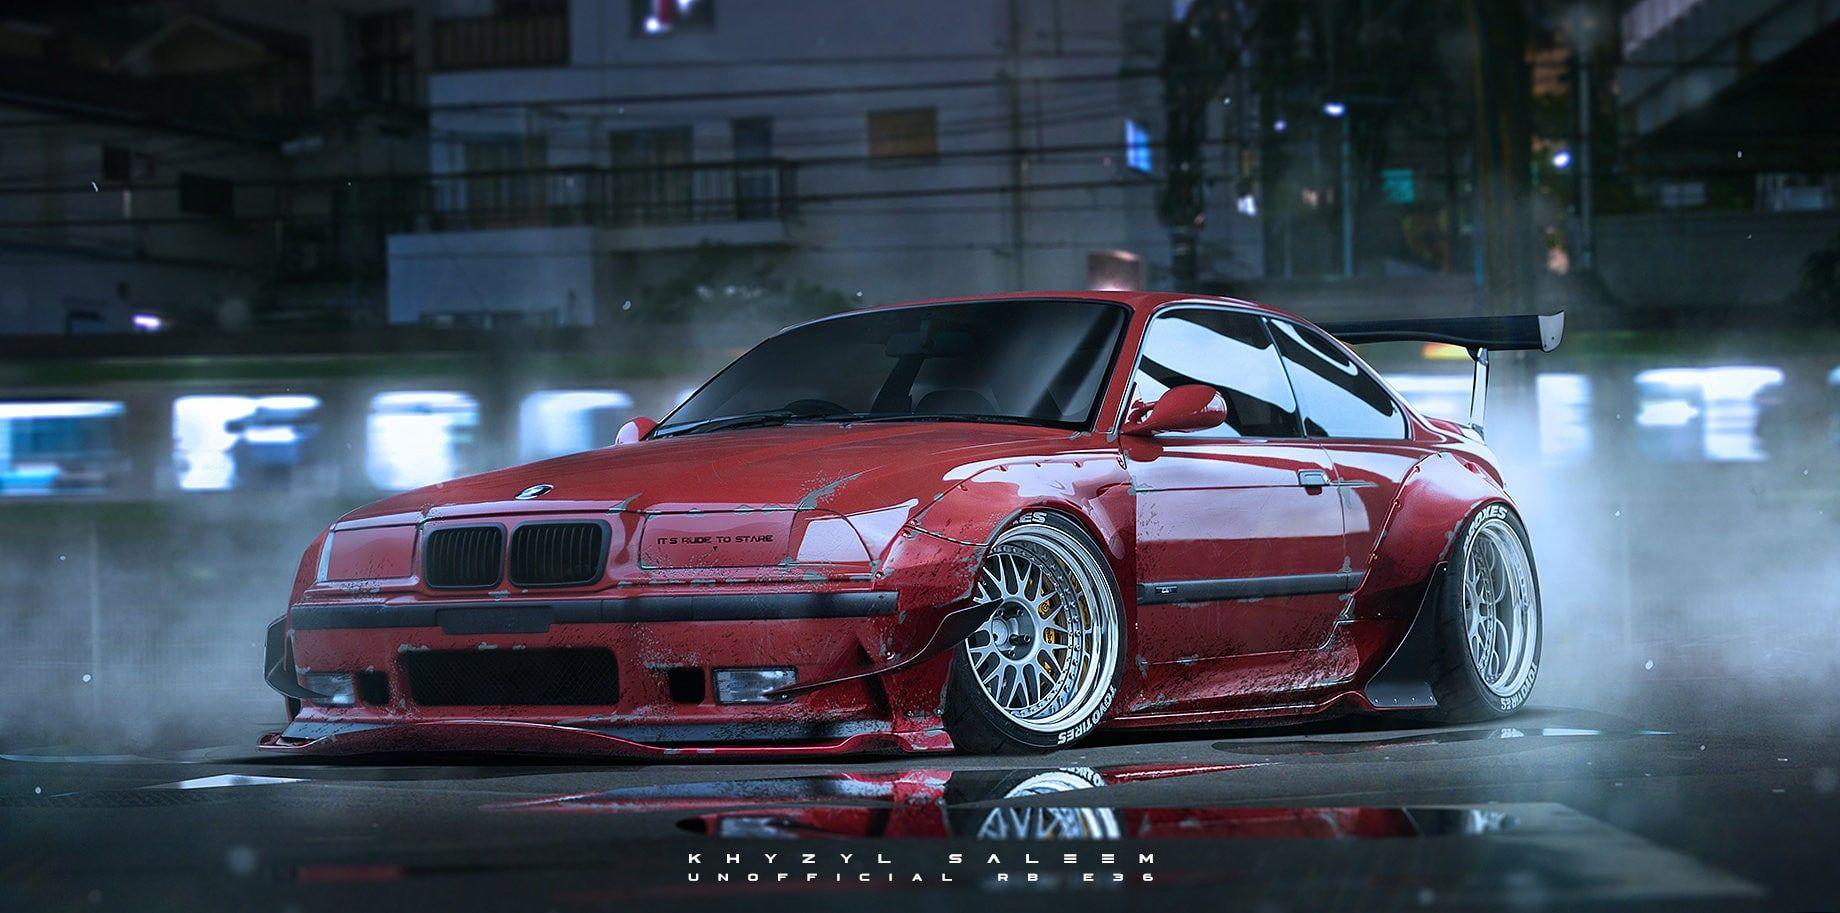 BMW E36 #BBS Toyo Tires #car Khyzyl Saleem #BMW #artwork #render #720P